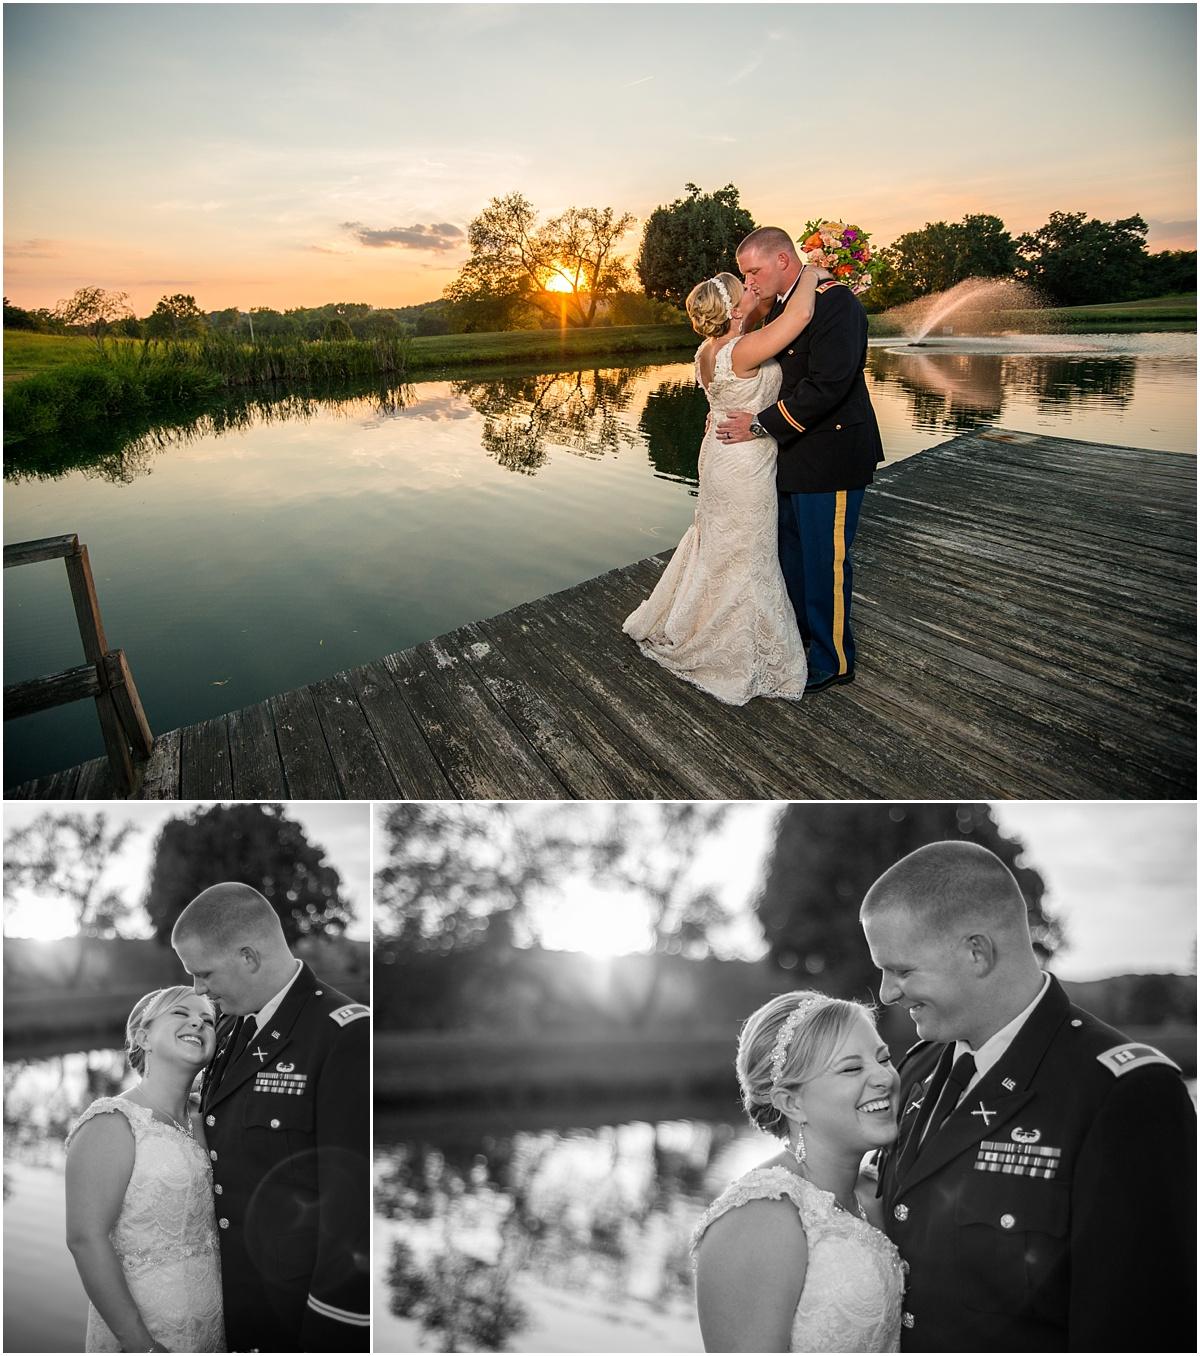 Greg Smit Photography Nashville wedding photographer Mint Springs Farm  26